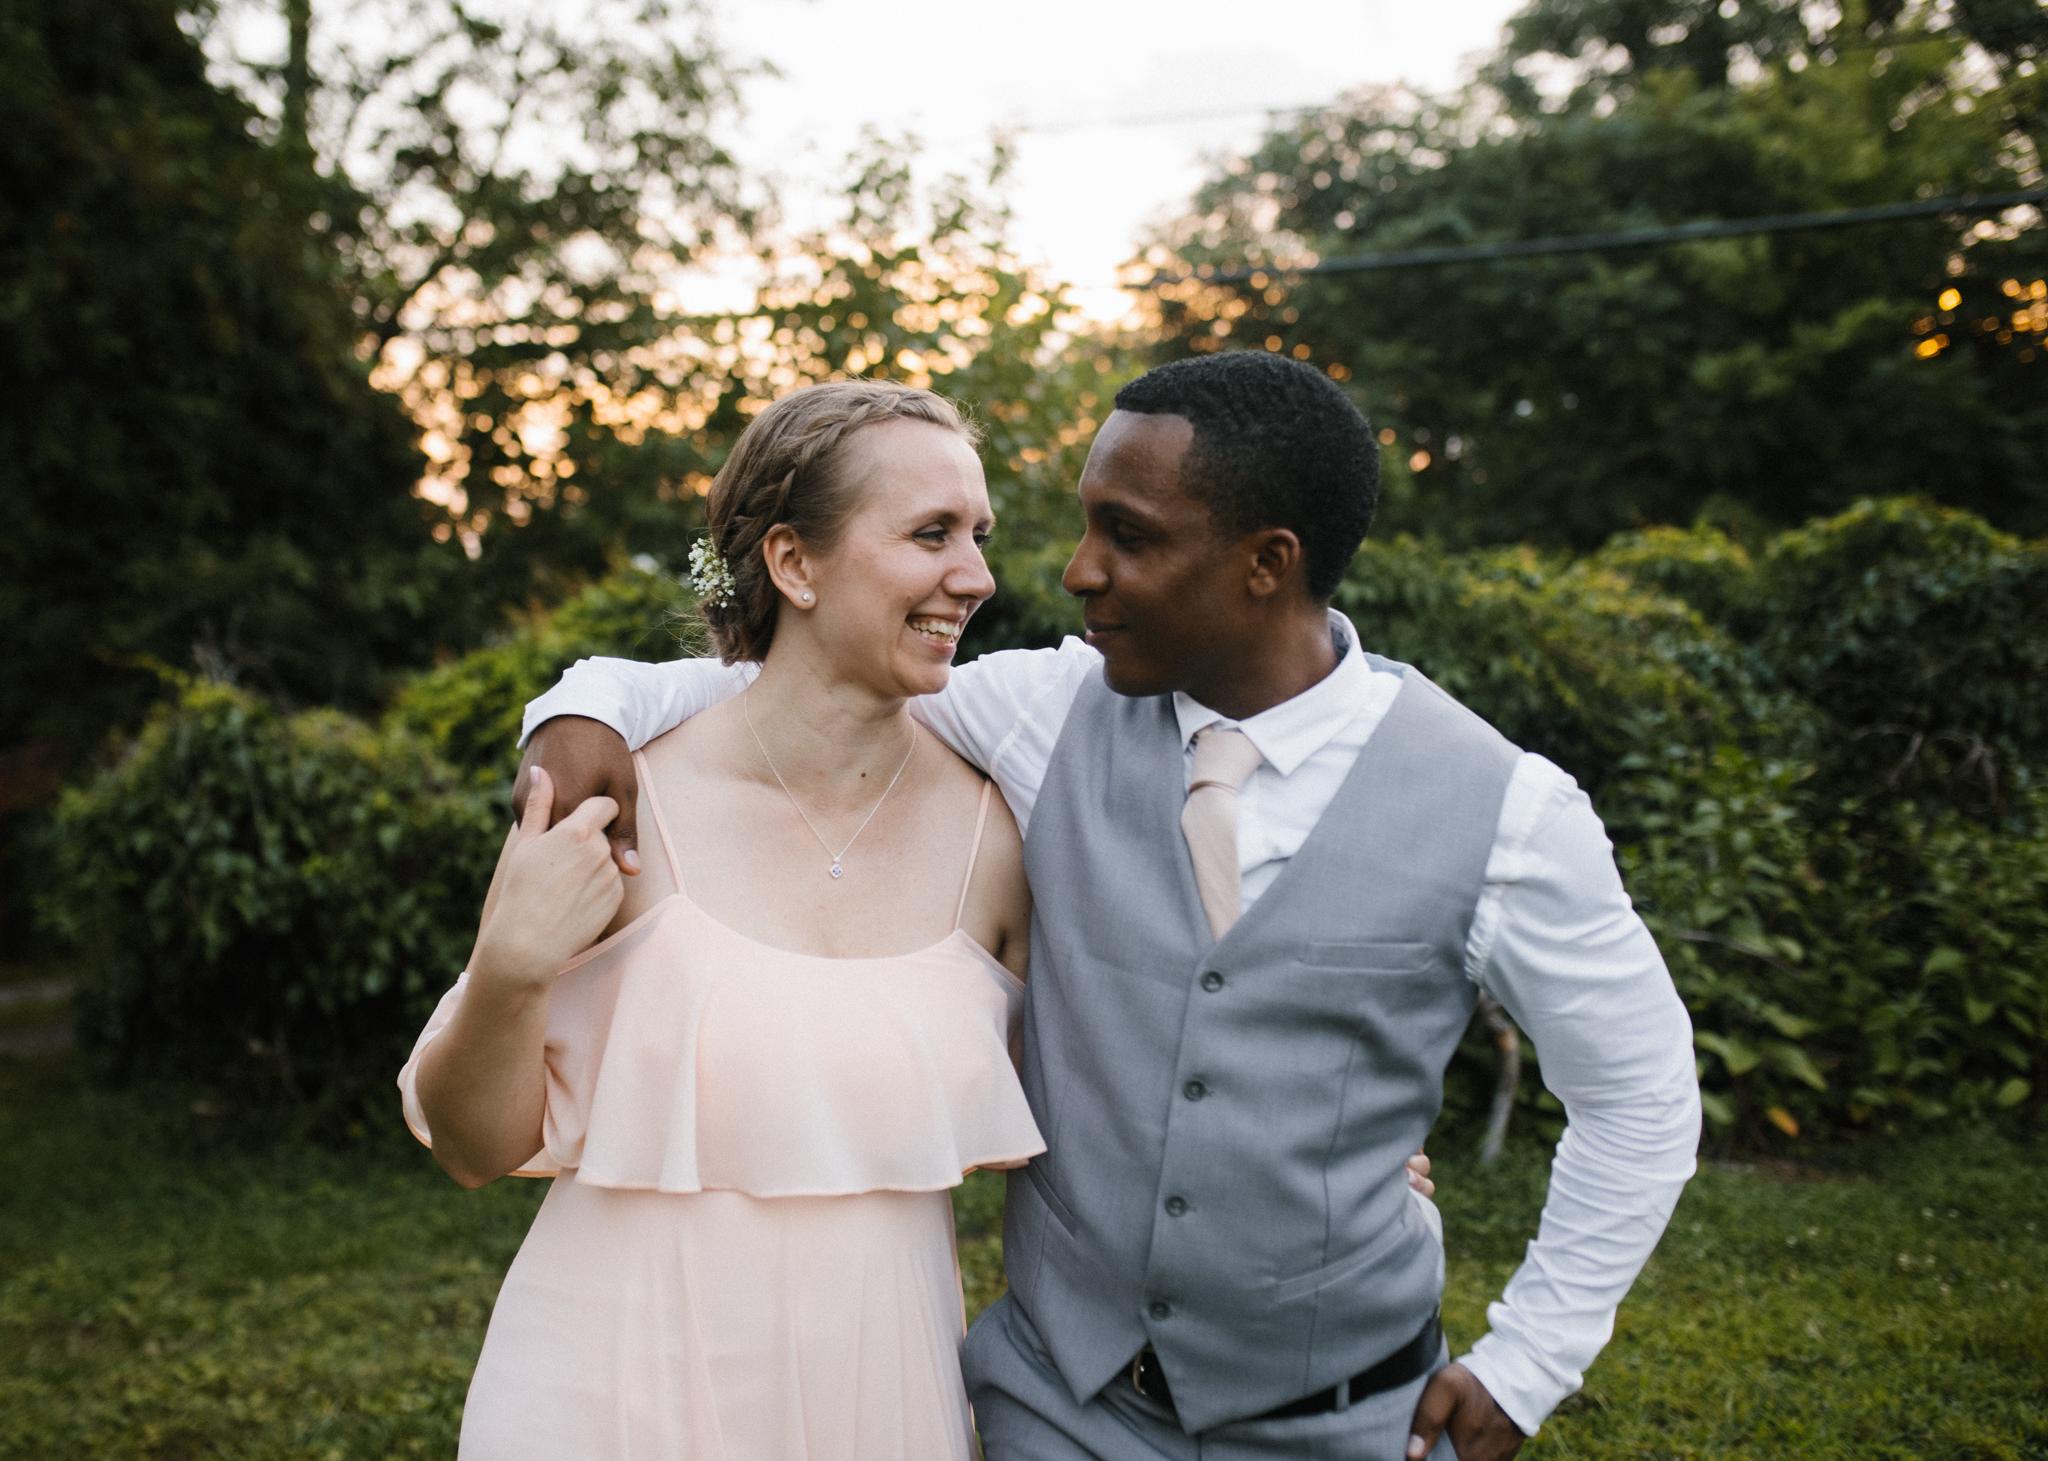 dorota_dwight_richmond_backyard_wedding-79.jpg